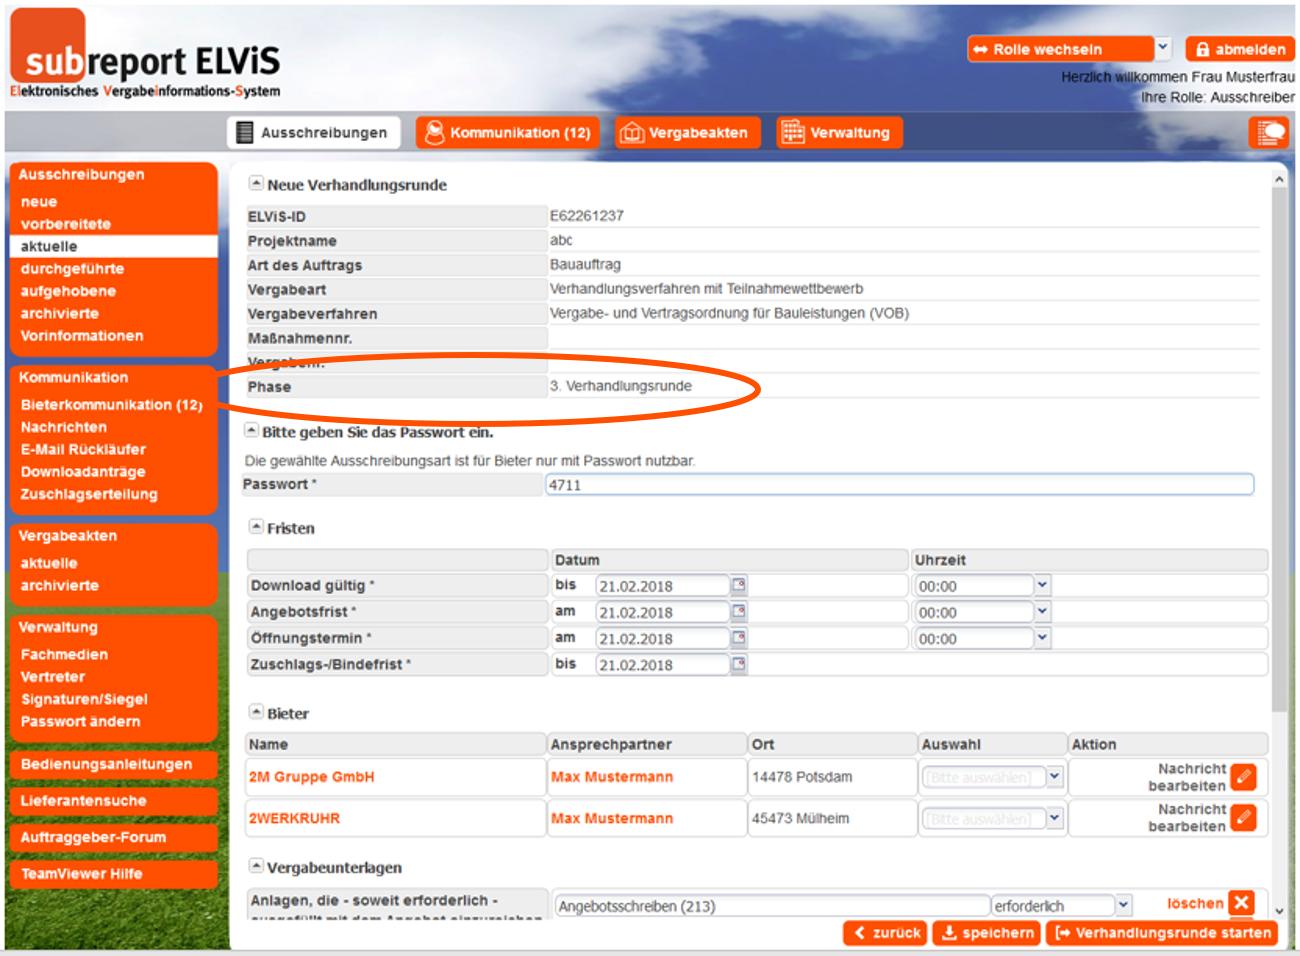 Neue Funktionen In Subreport Elvis Großer Relaunch Am 19 Februar